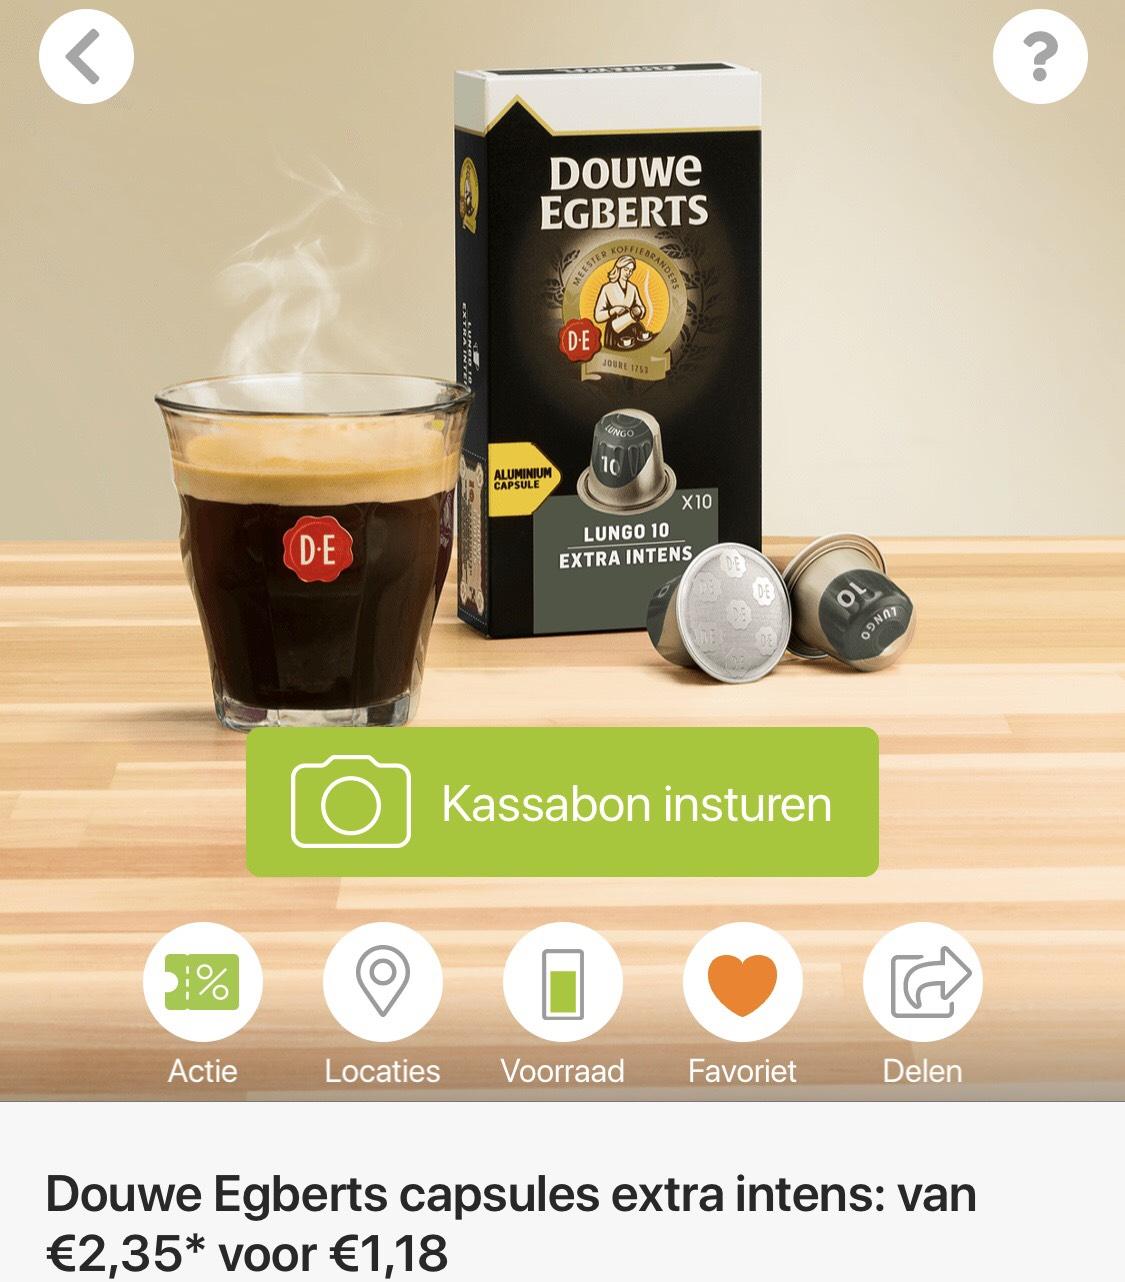 Douwe Egberts capsules extra intens 50% korting @Scoupy